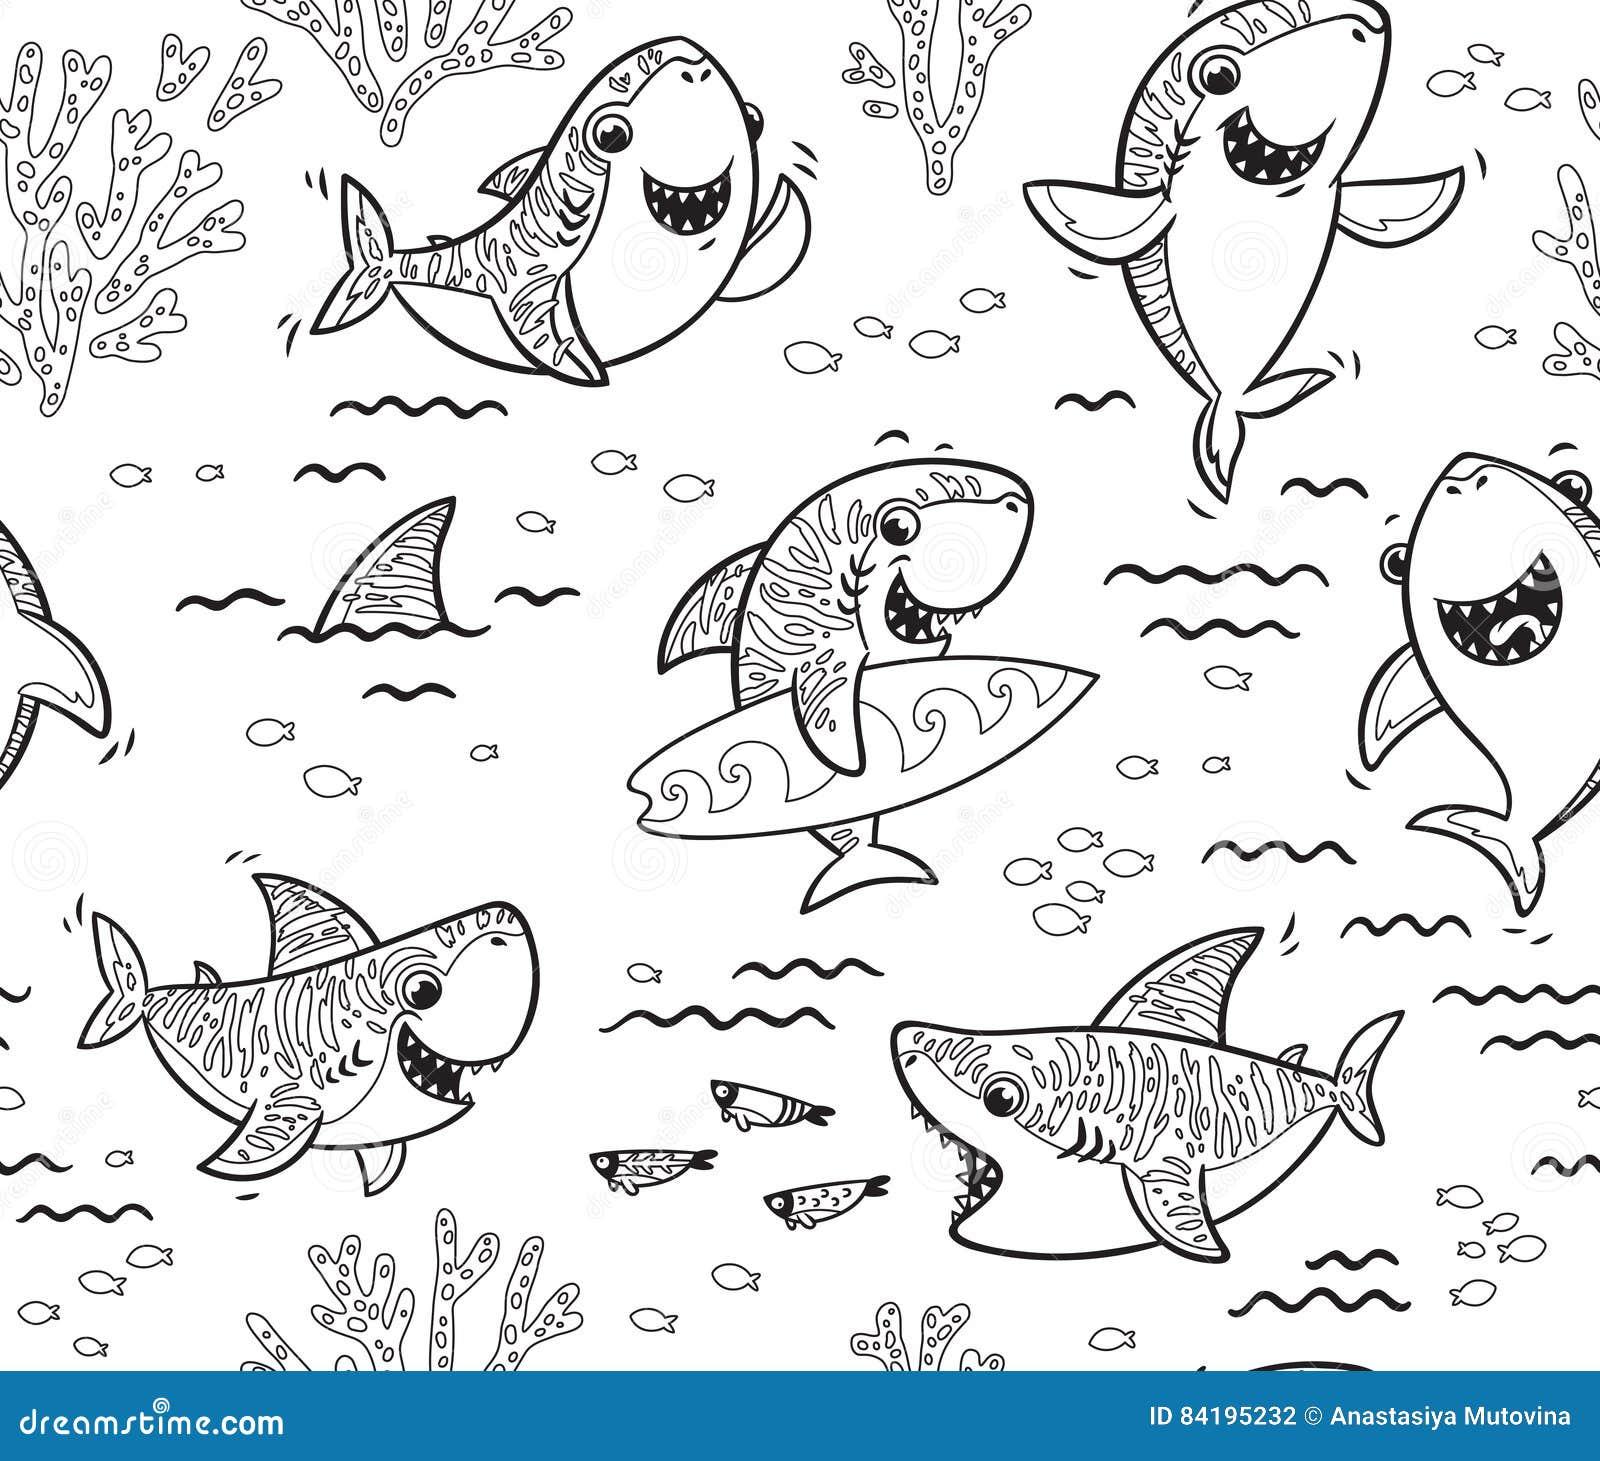 Cartoon Smiling Baby Shark Stock Photography ...